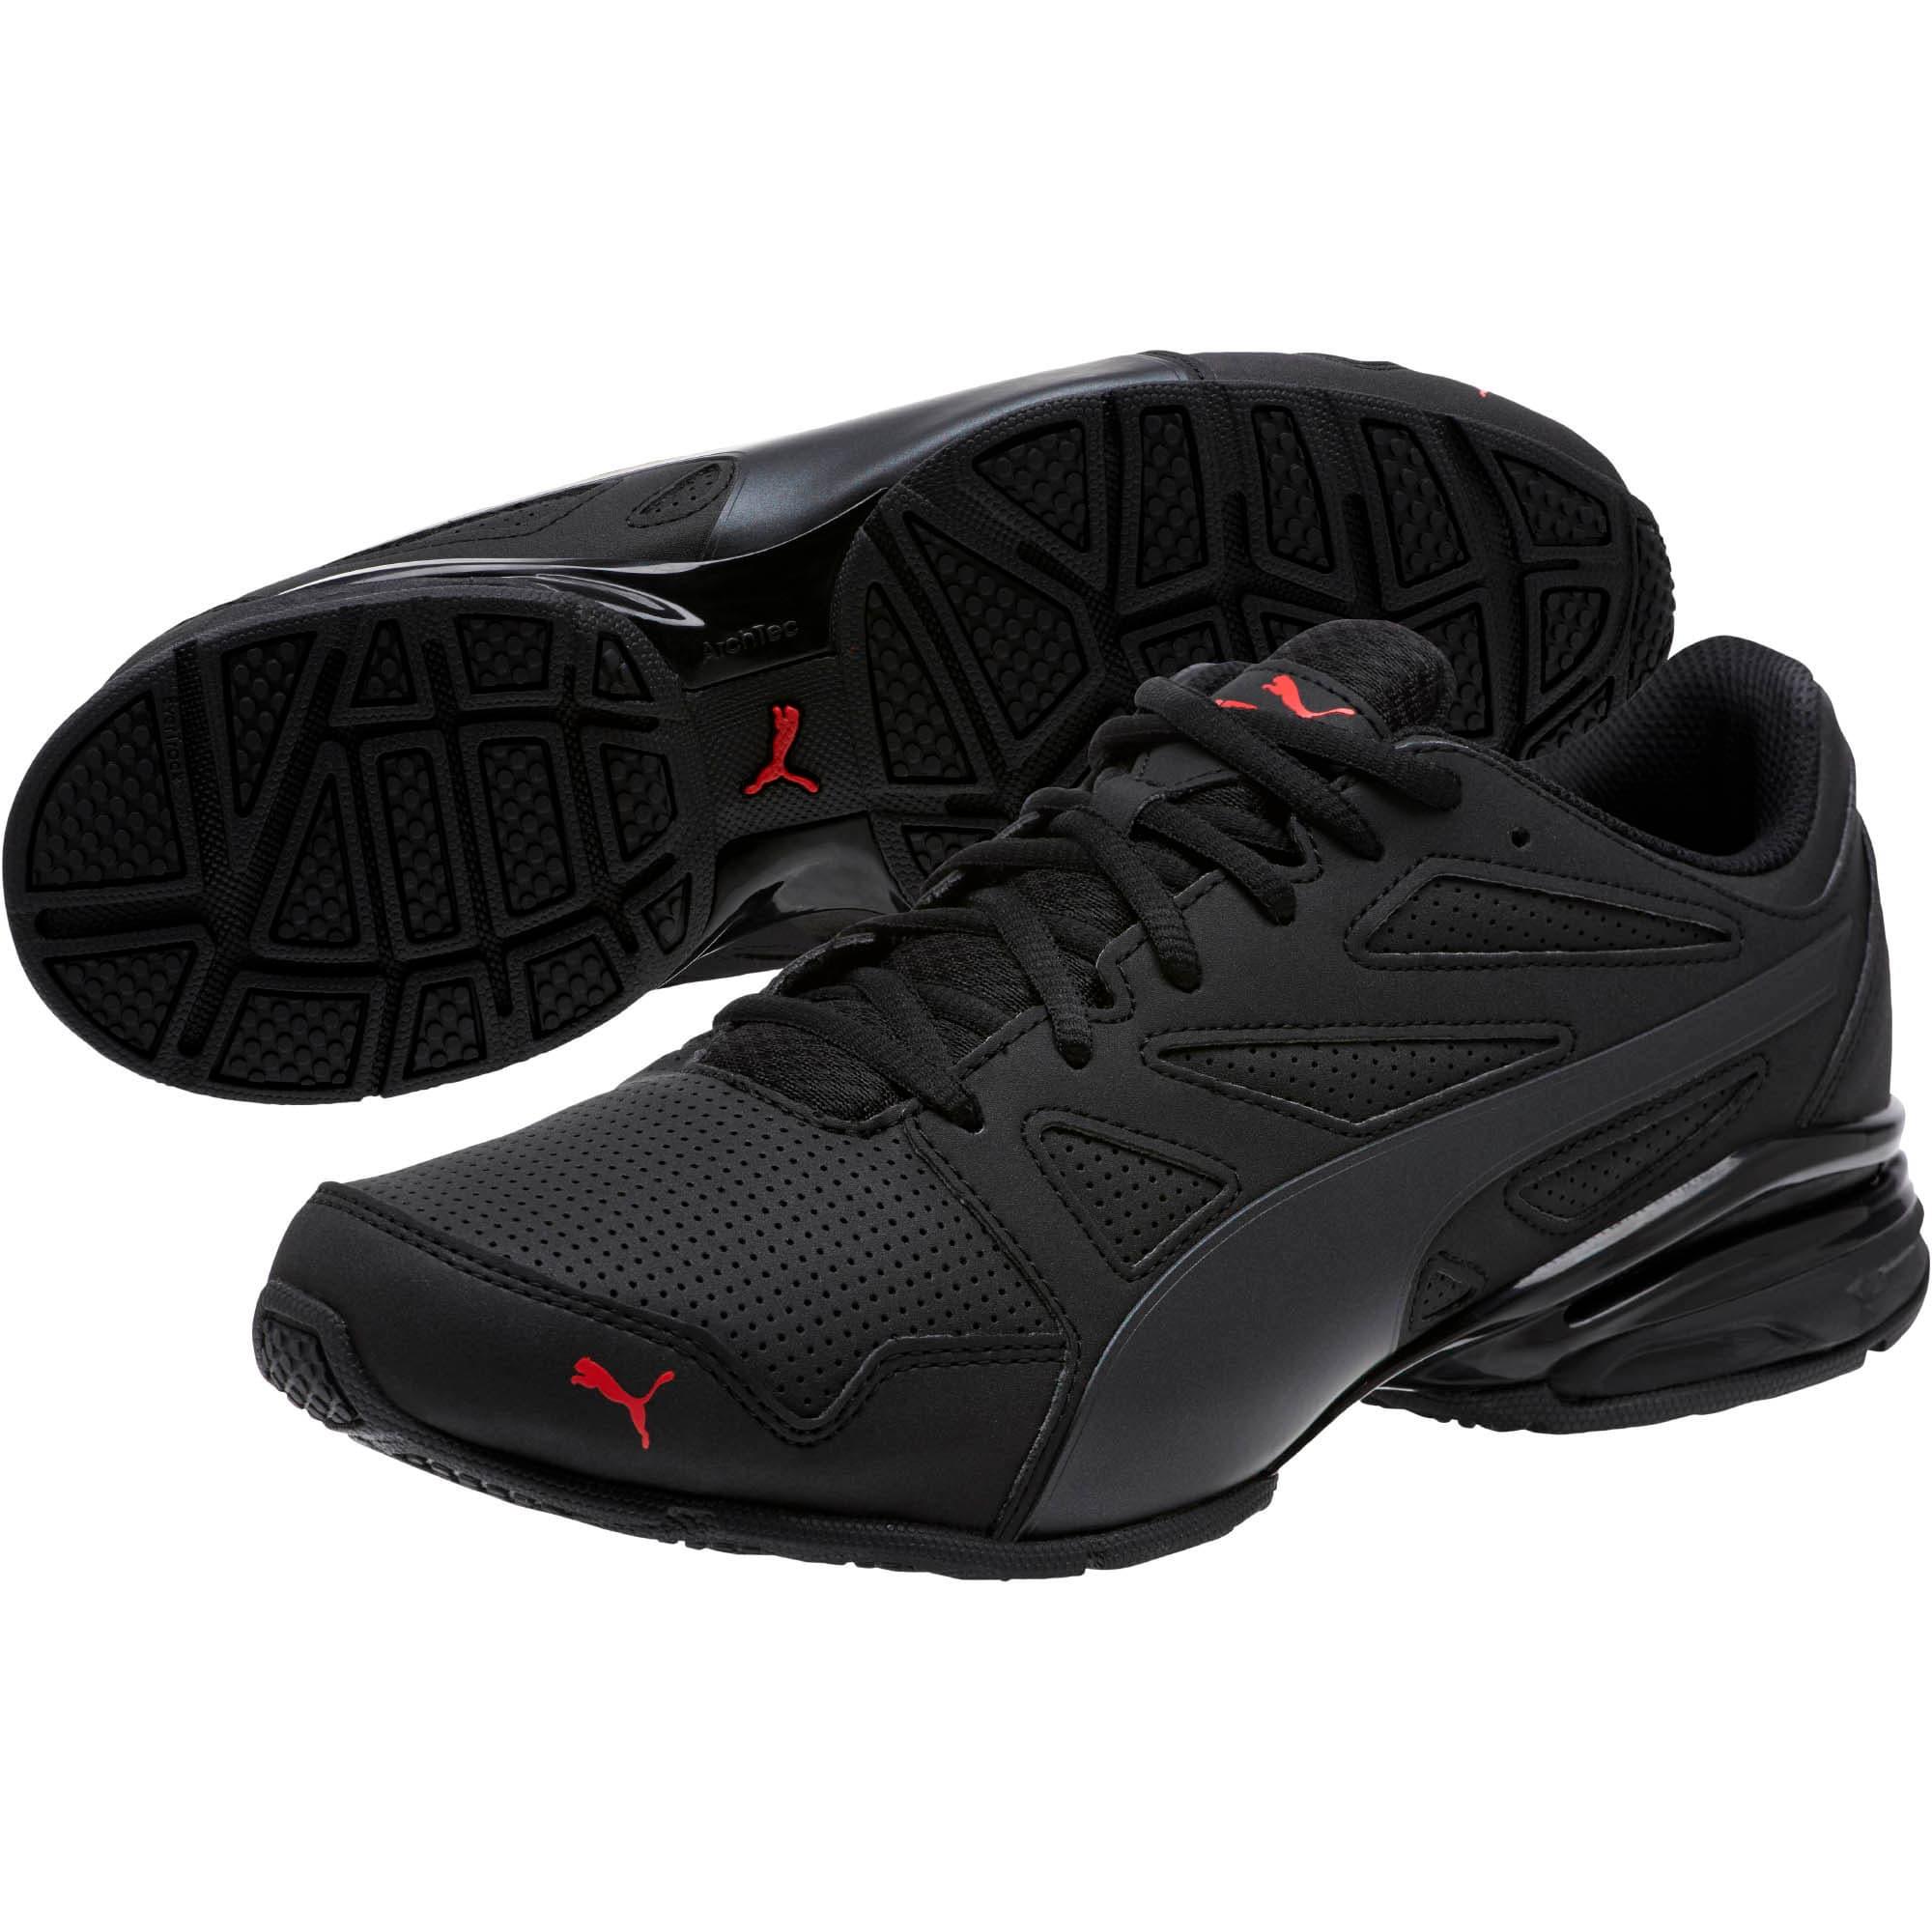 Thumbnail 2 of Tazon Modern SL FM Men's Sneakers, Puma Black-high risk red, medium